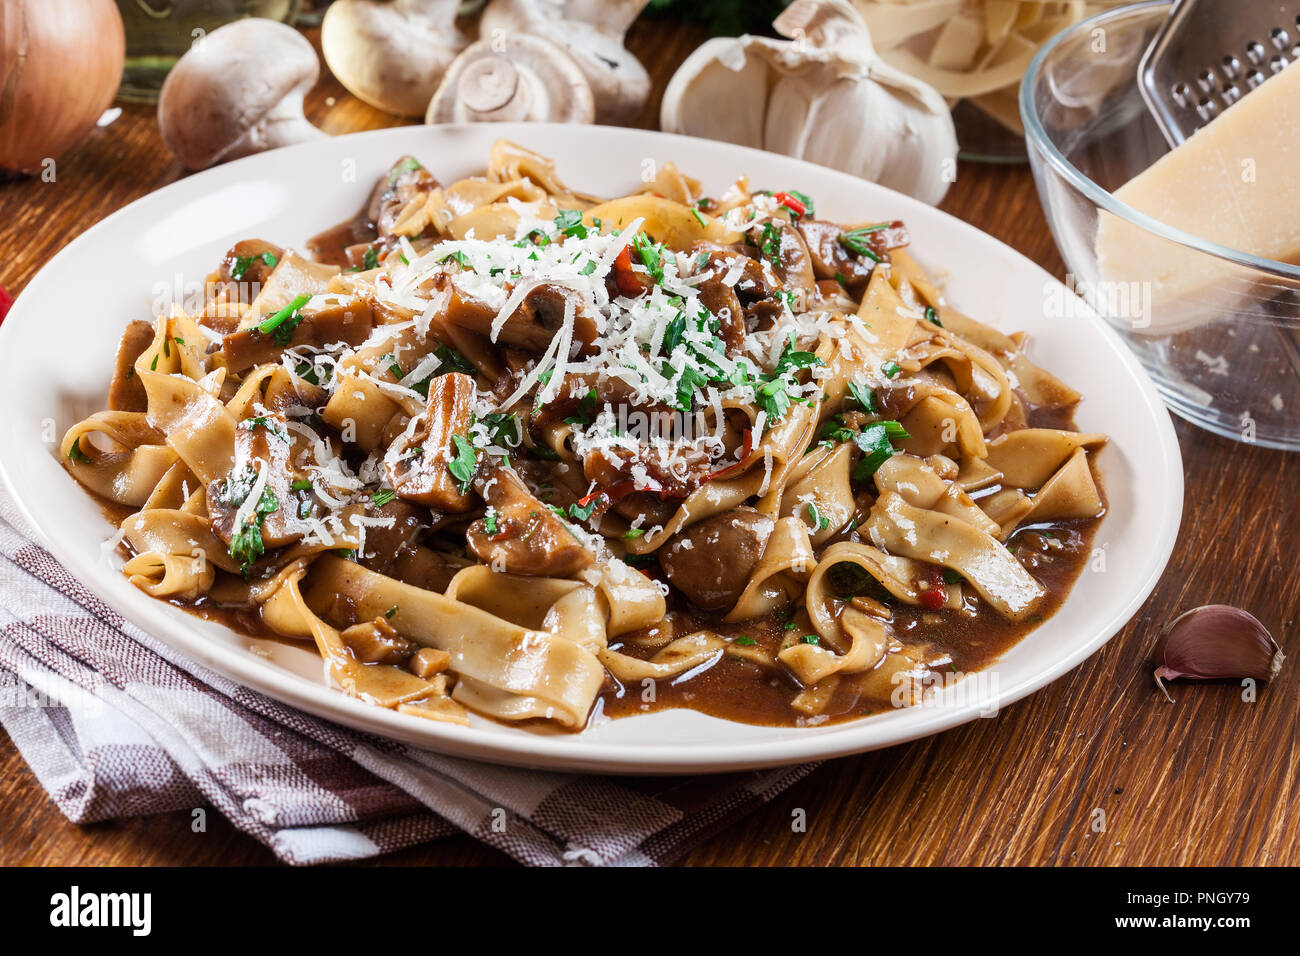 Bandnudeln mit Champignon in mushroom Gravy. Italienische Gericht Stockbild